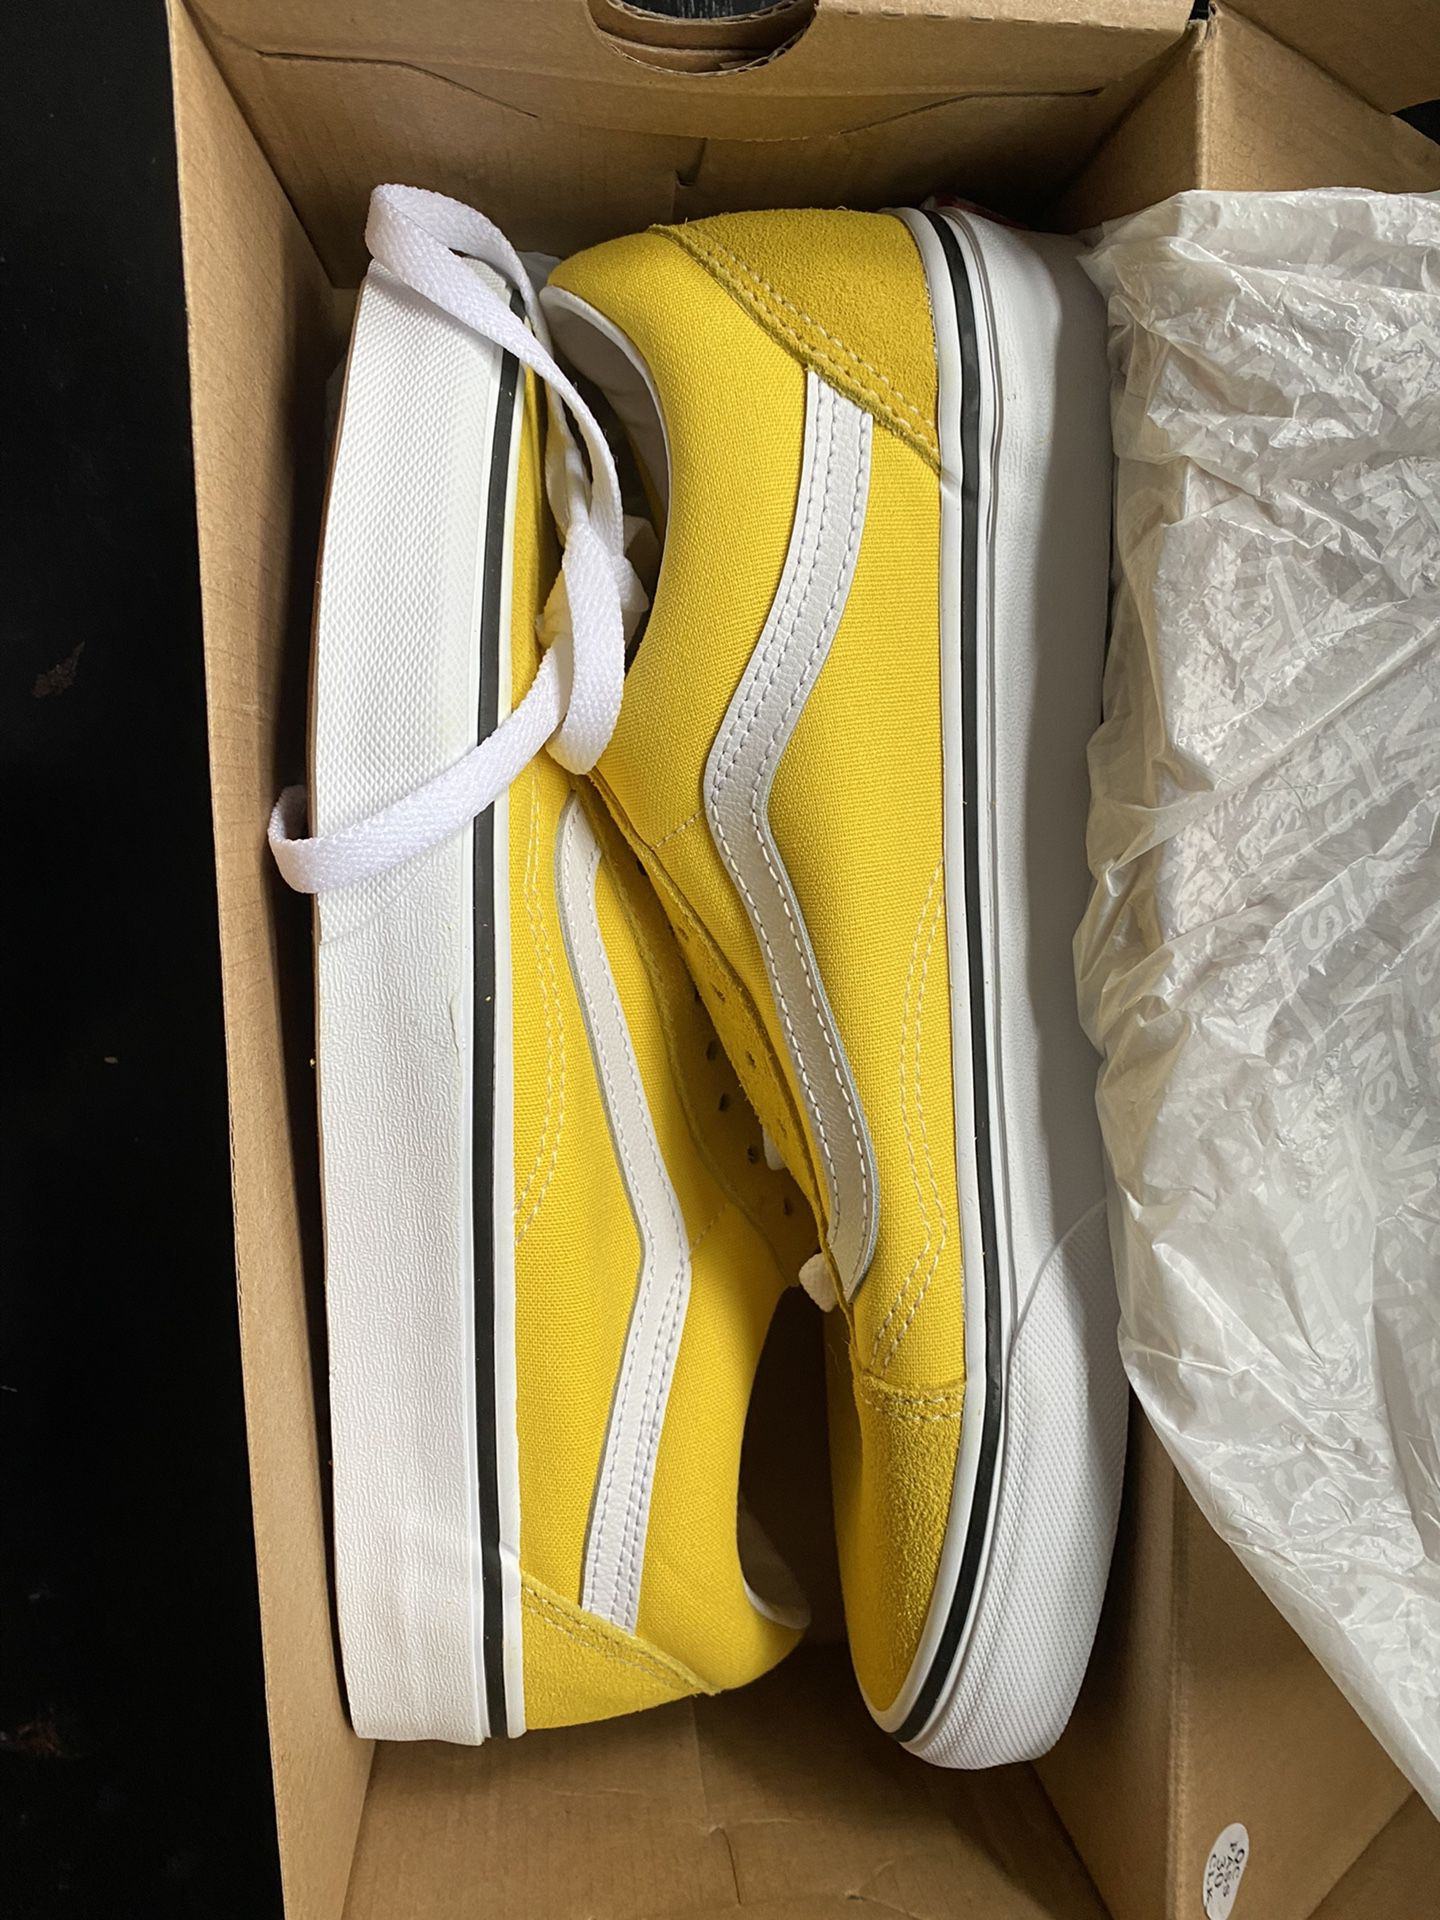 New Vans sneakers